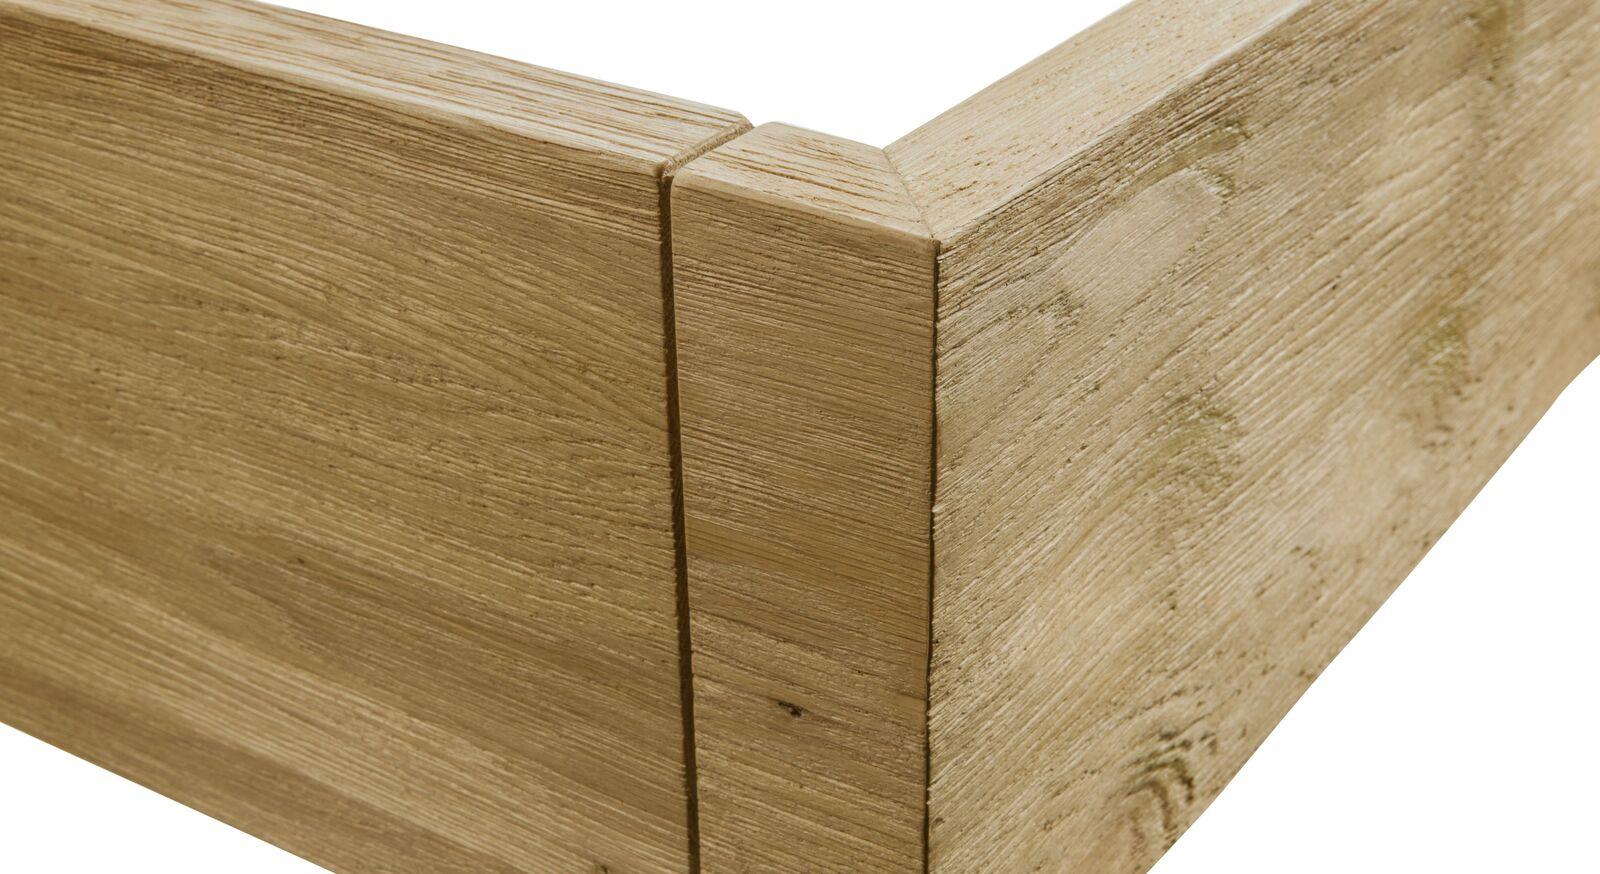 Bett Karvel mit stabil verarbeitetem Holzrahmen